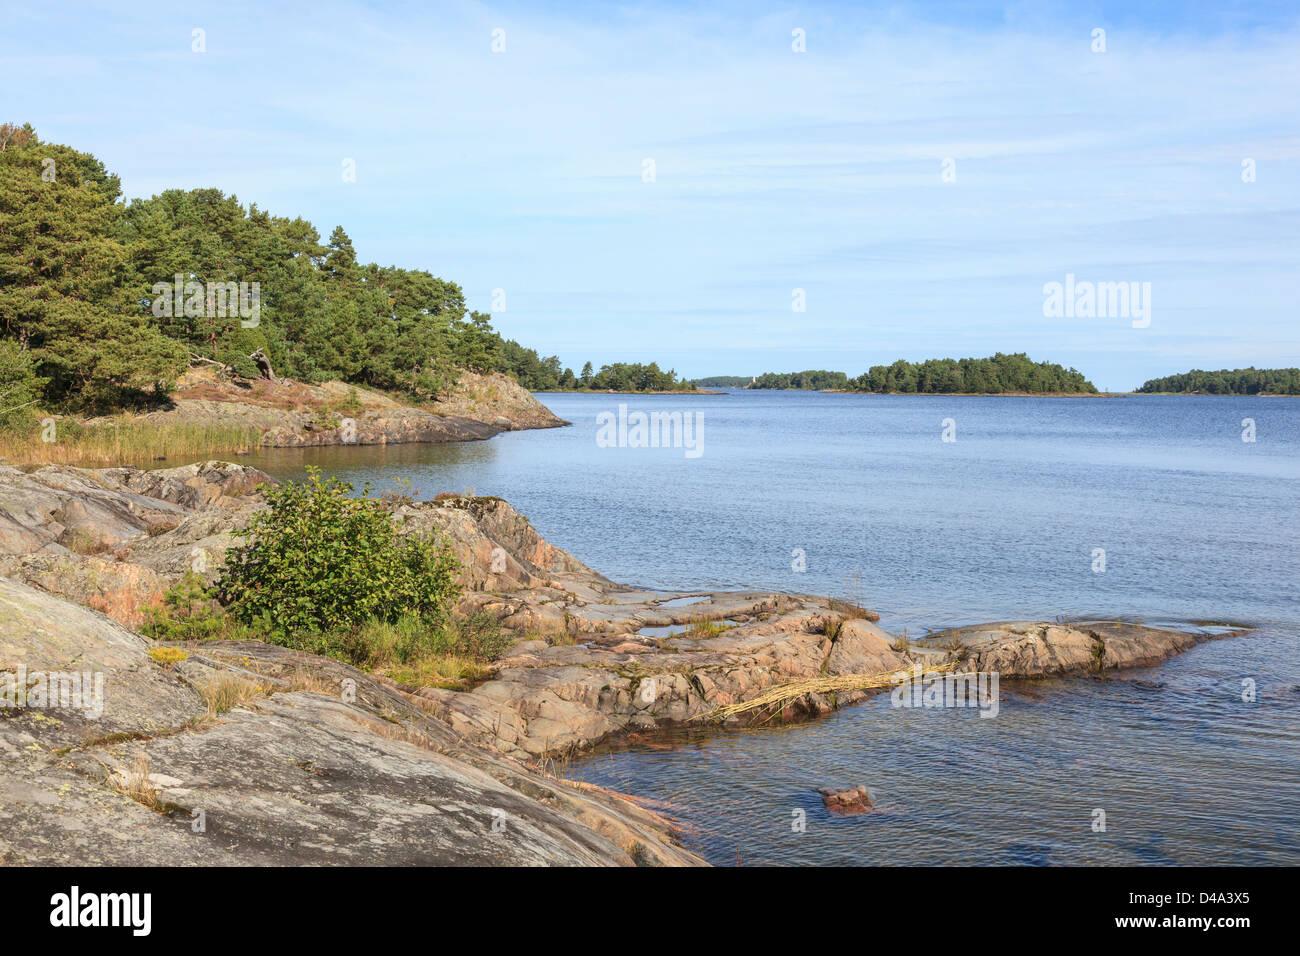 Archipelago in lake Vanern in Sweden - Stock Image